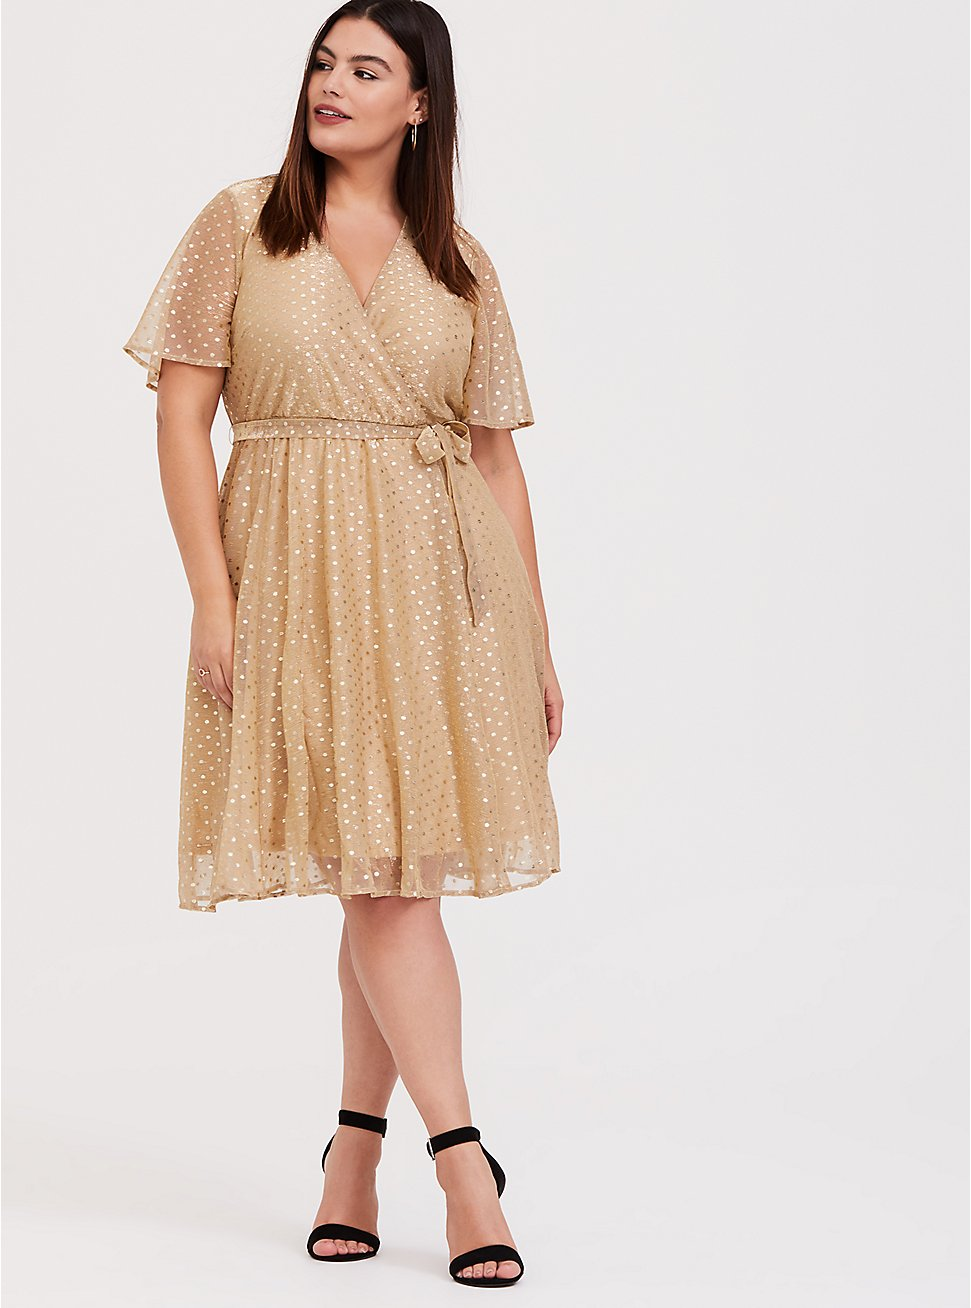 Gold Metallic Polka Dot Mesh Wrap Dress, , fitModel1-hires